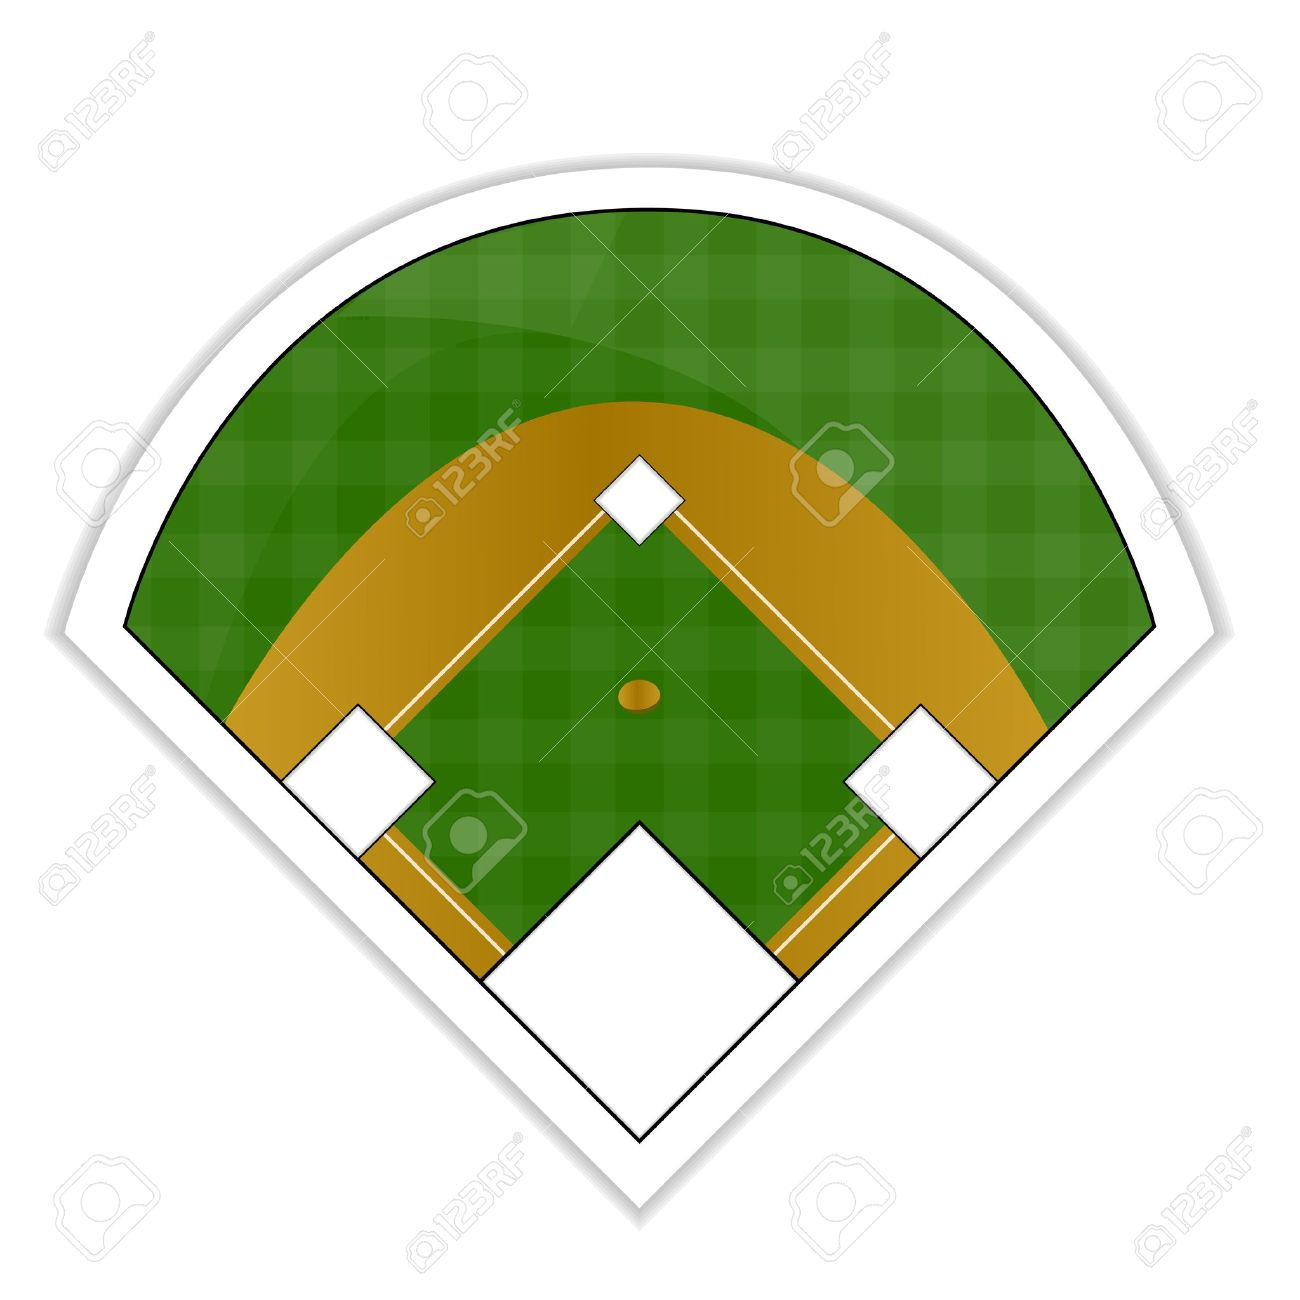 baseball field sticker royalty free cliparts vectors and stock rh 123rf com baseball diamond vector free